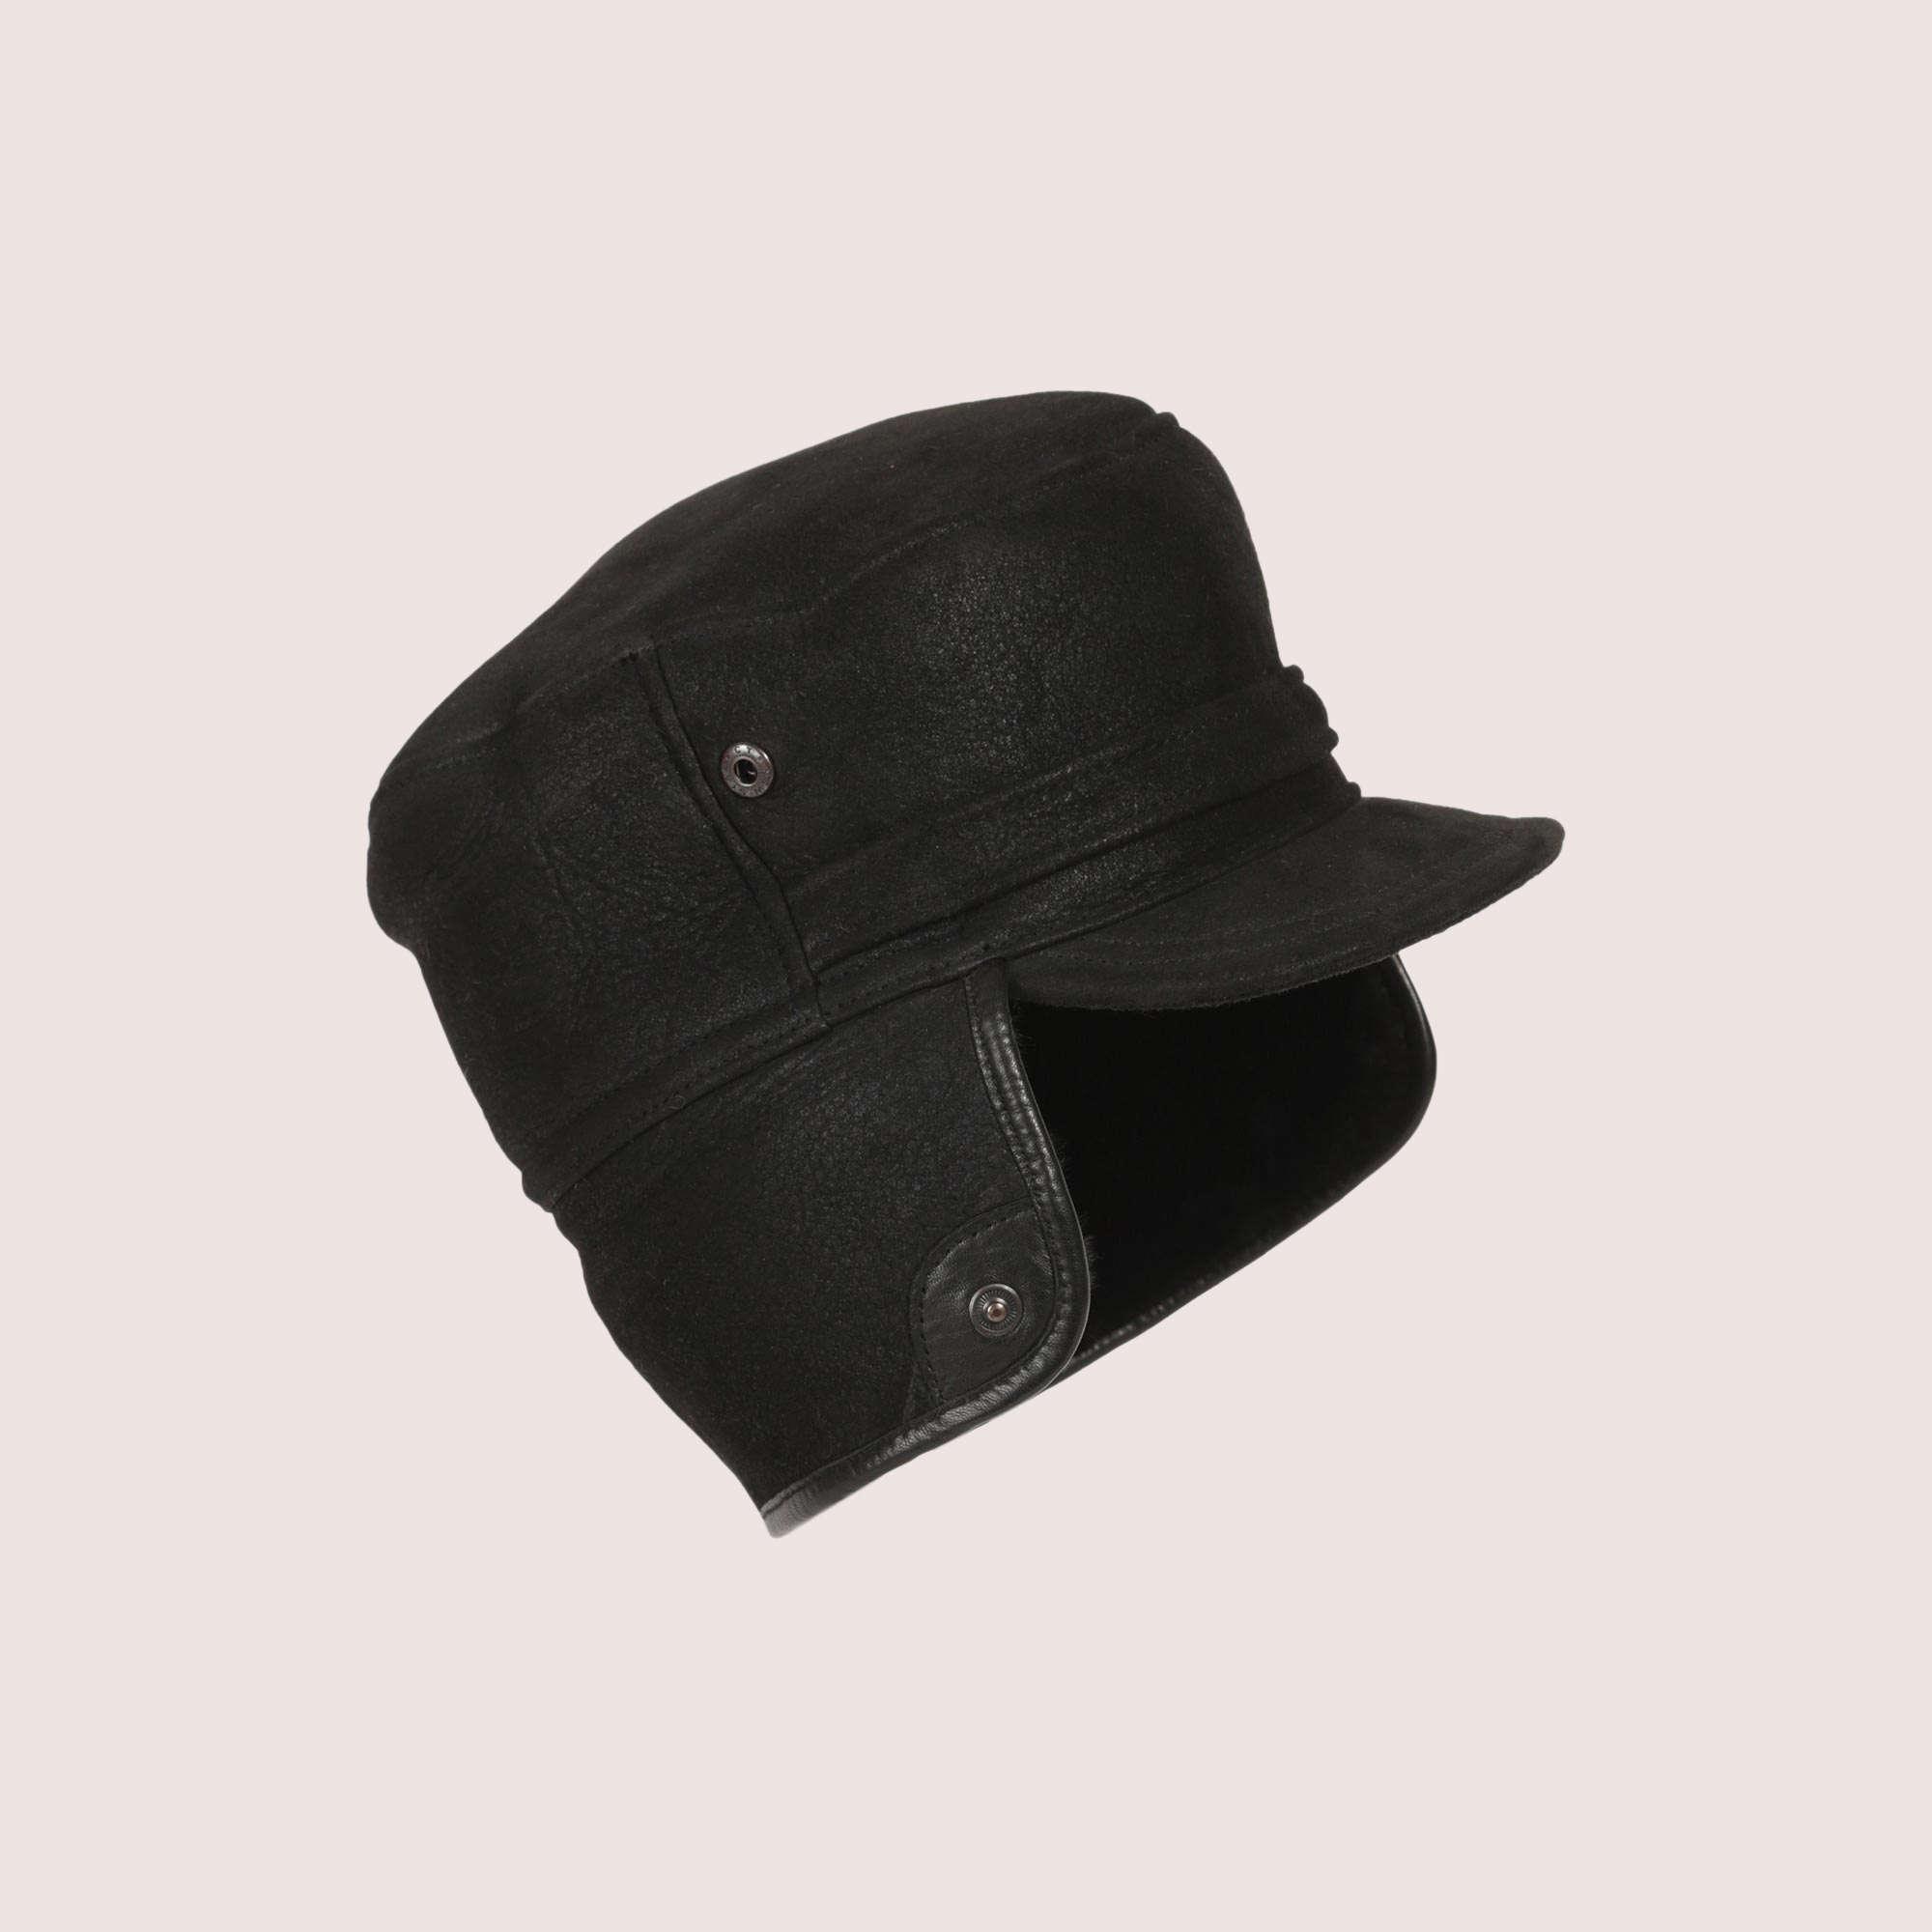 Men's Winnipeg Sheepskin Hat w/ LB Trim